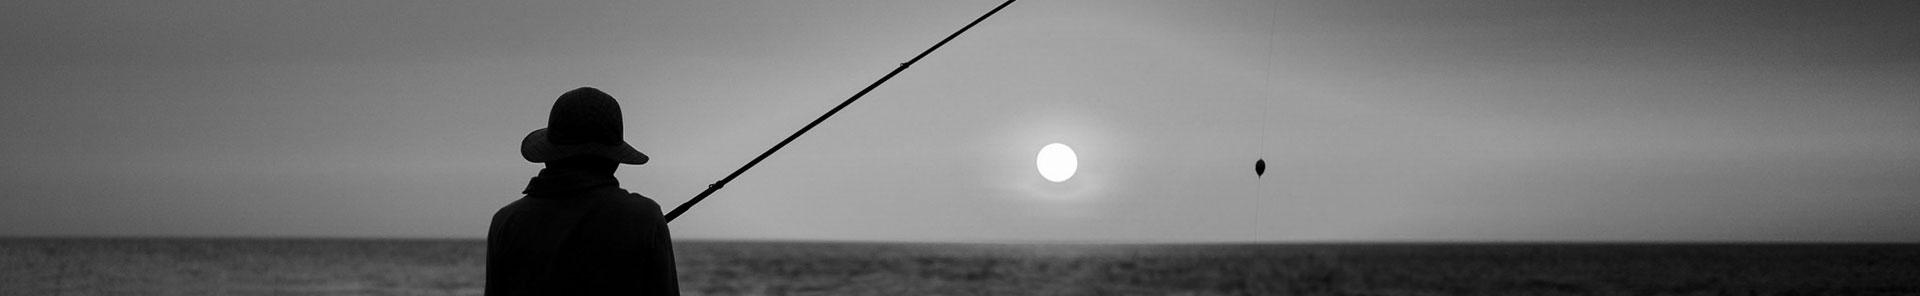 Tips for fishing crucian carp in spring